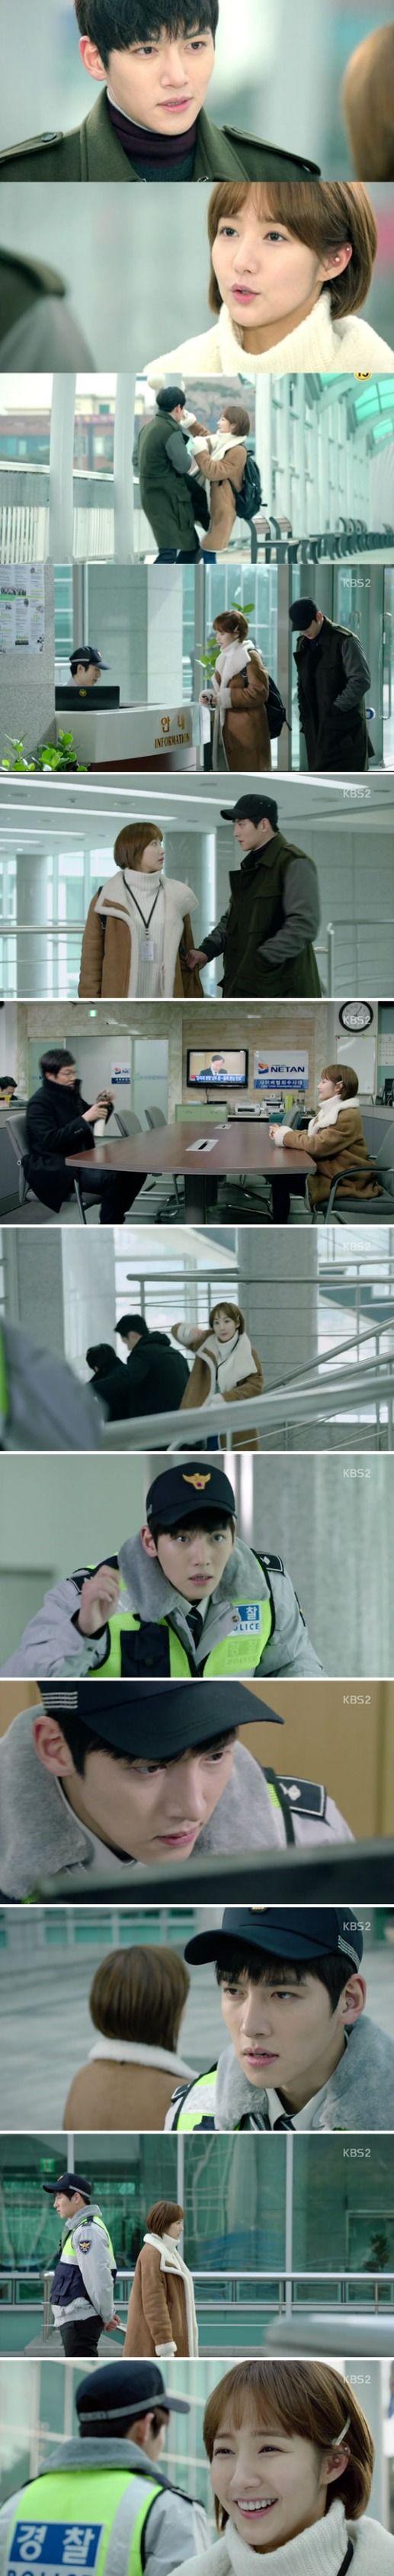 Healer (힐러) Korean - Drama - Episode 15 - Picture @ HanCinema :: The Korean Movie and Drama Database